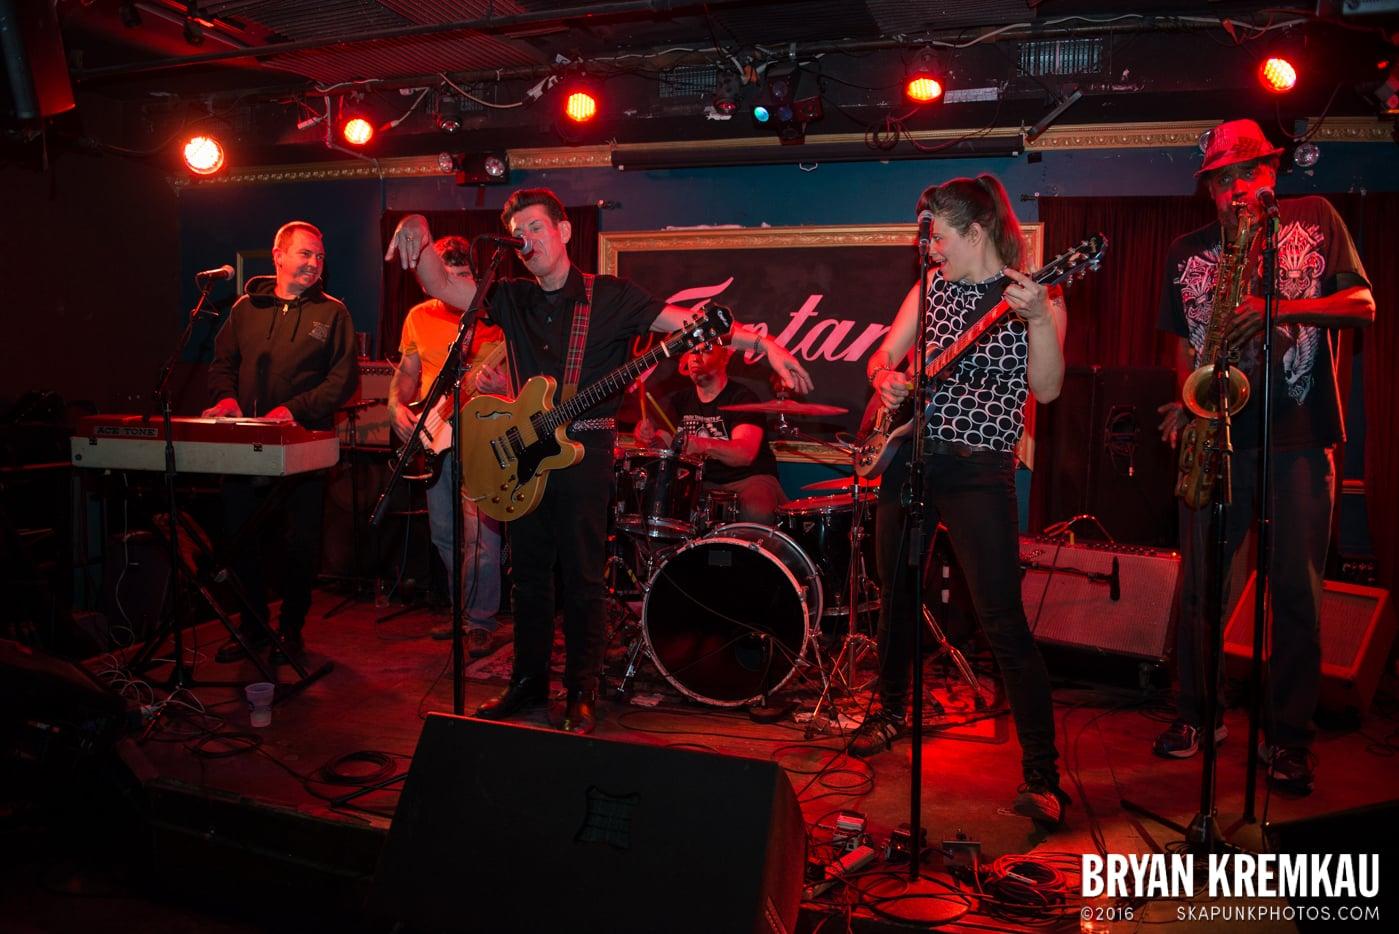 Roddy Radiation & The Scotch Bonnets @ Fontana's, NYC - 4.25.15 (17)